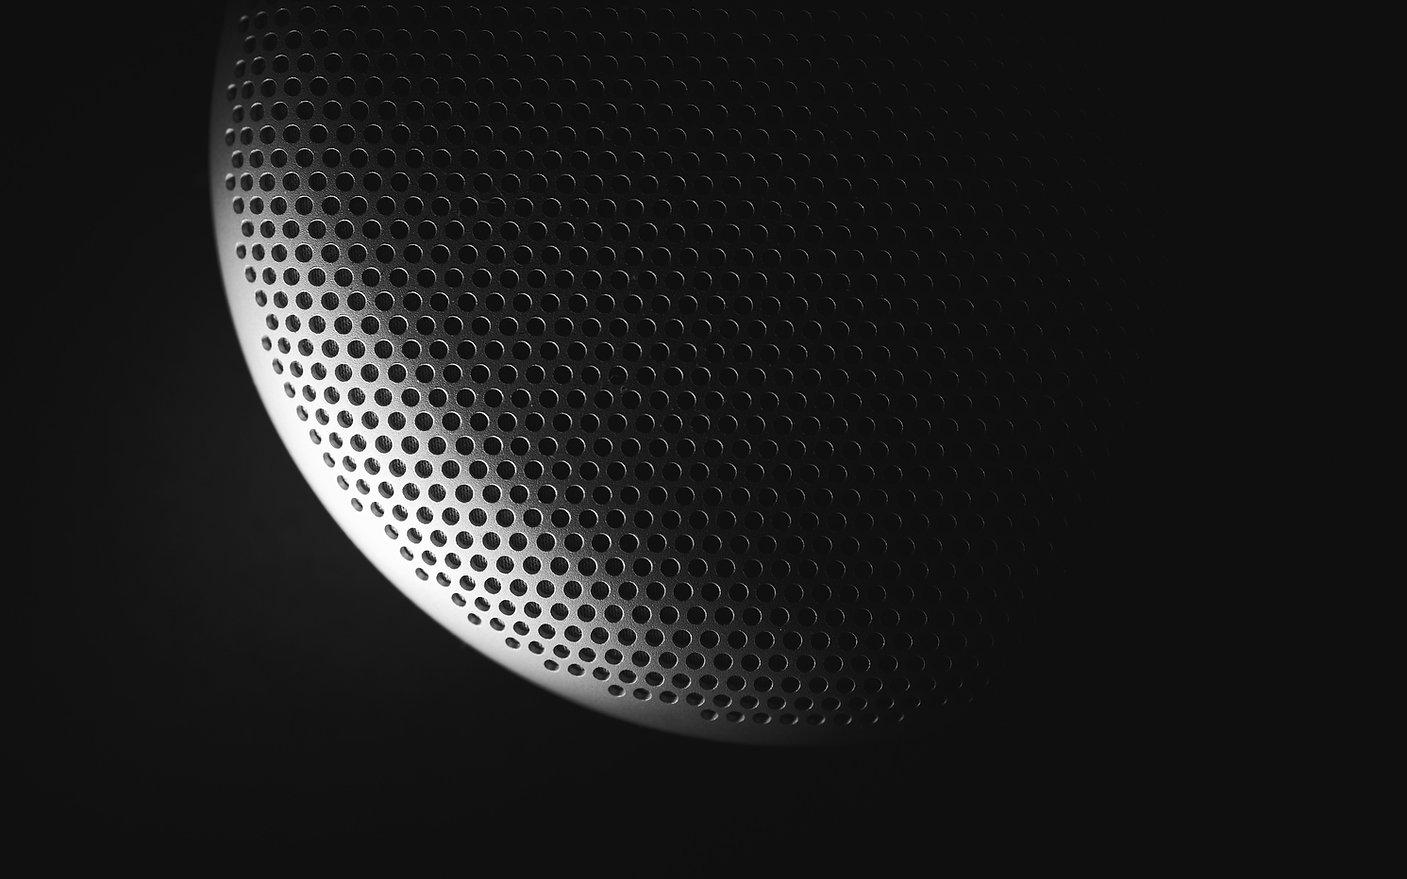 Microfone Close-Up